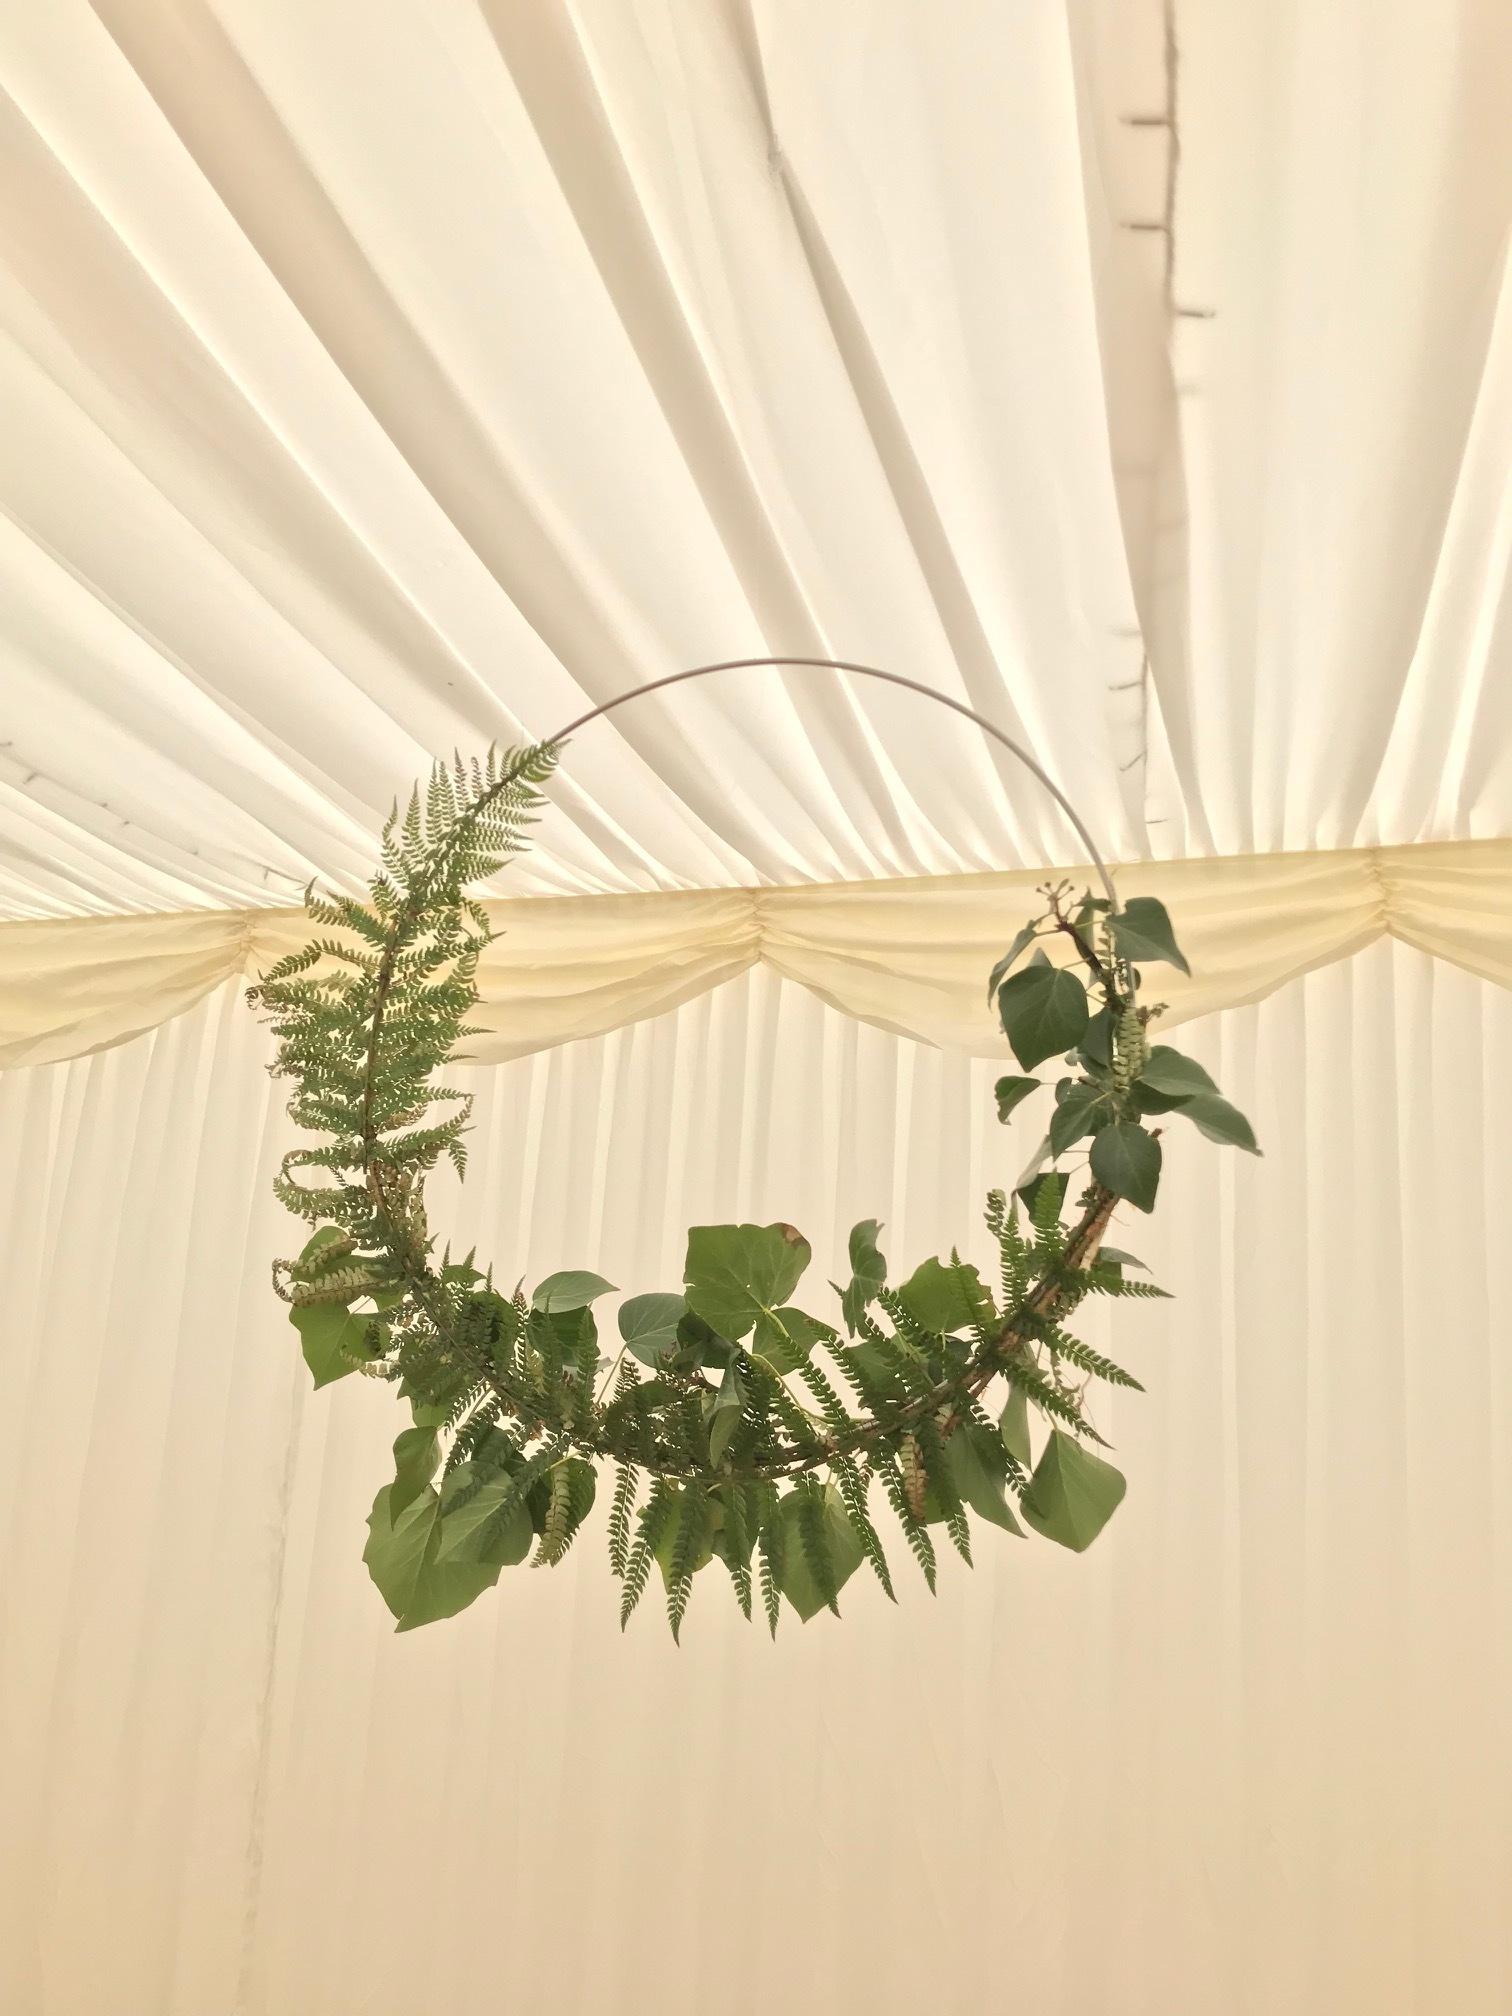 Foliage hoops at a wedding